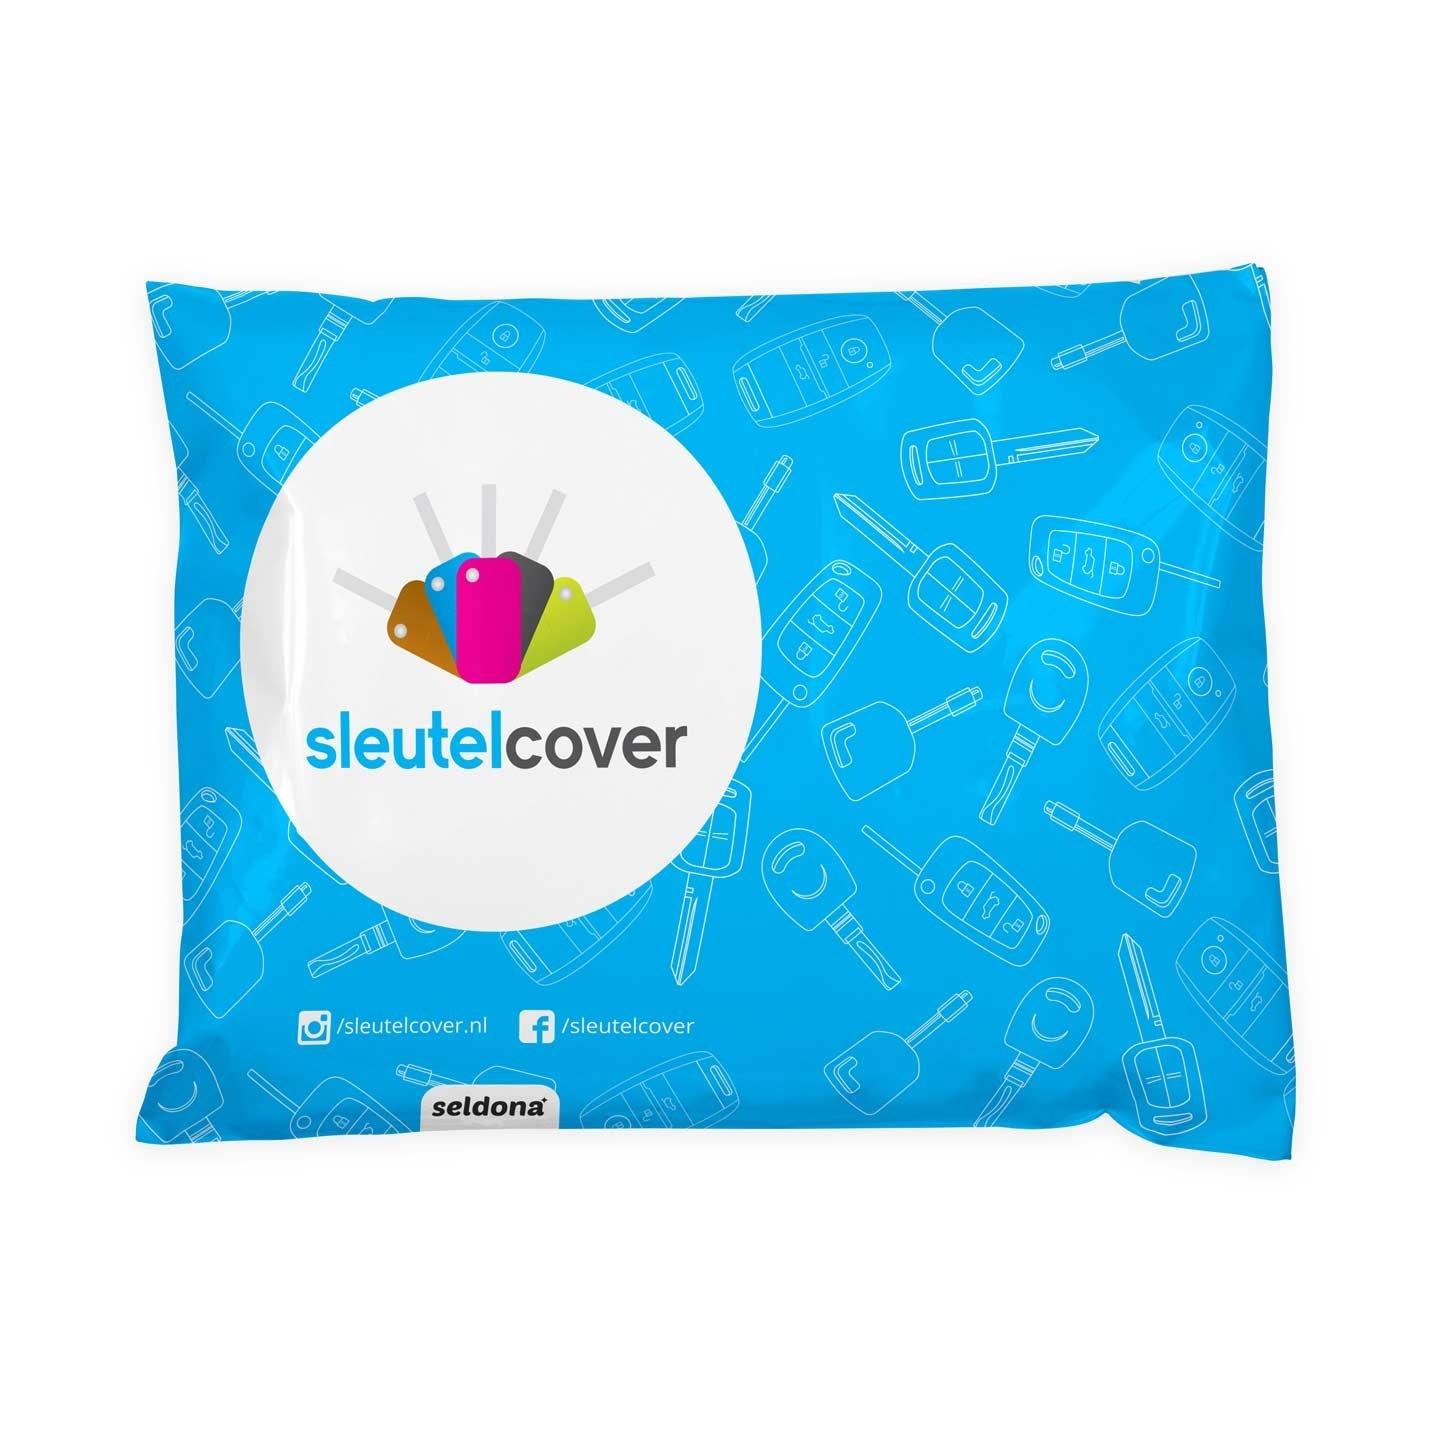 Volkswagen SleutelCover - Lichtblauw / Silicone sleutelhoesje / beschermhoesje autosleutel